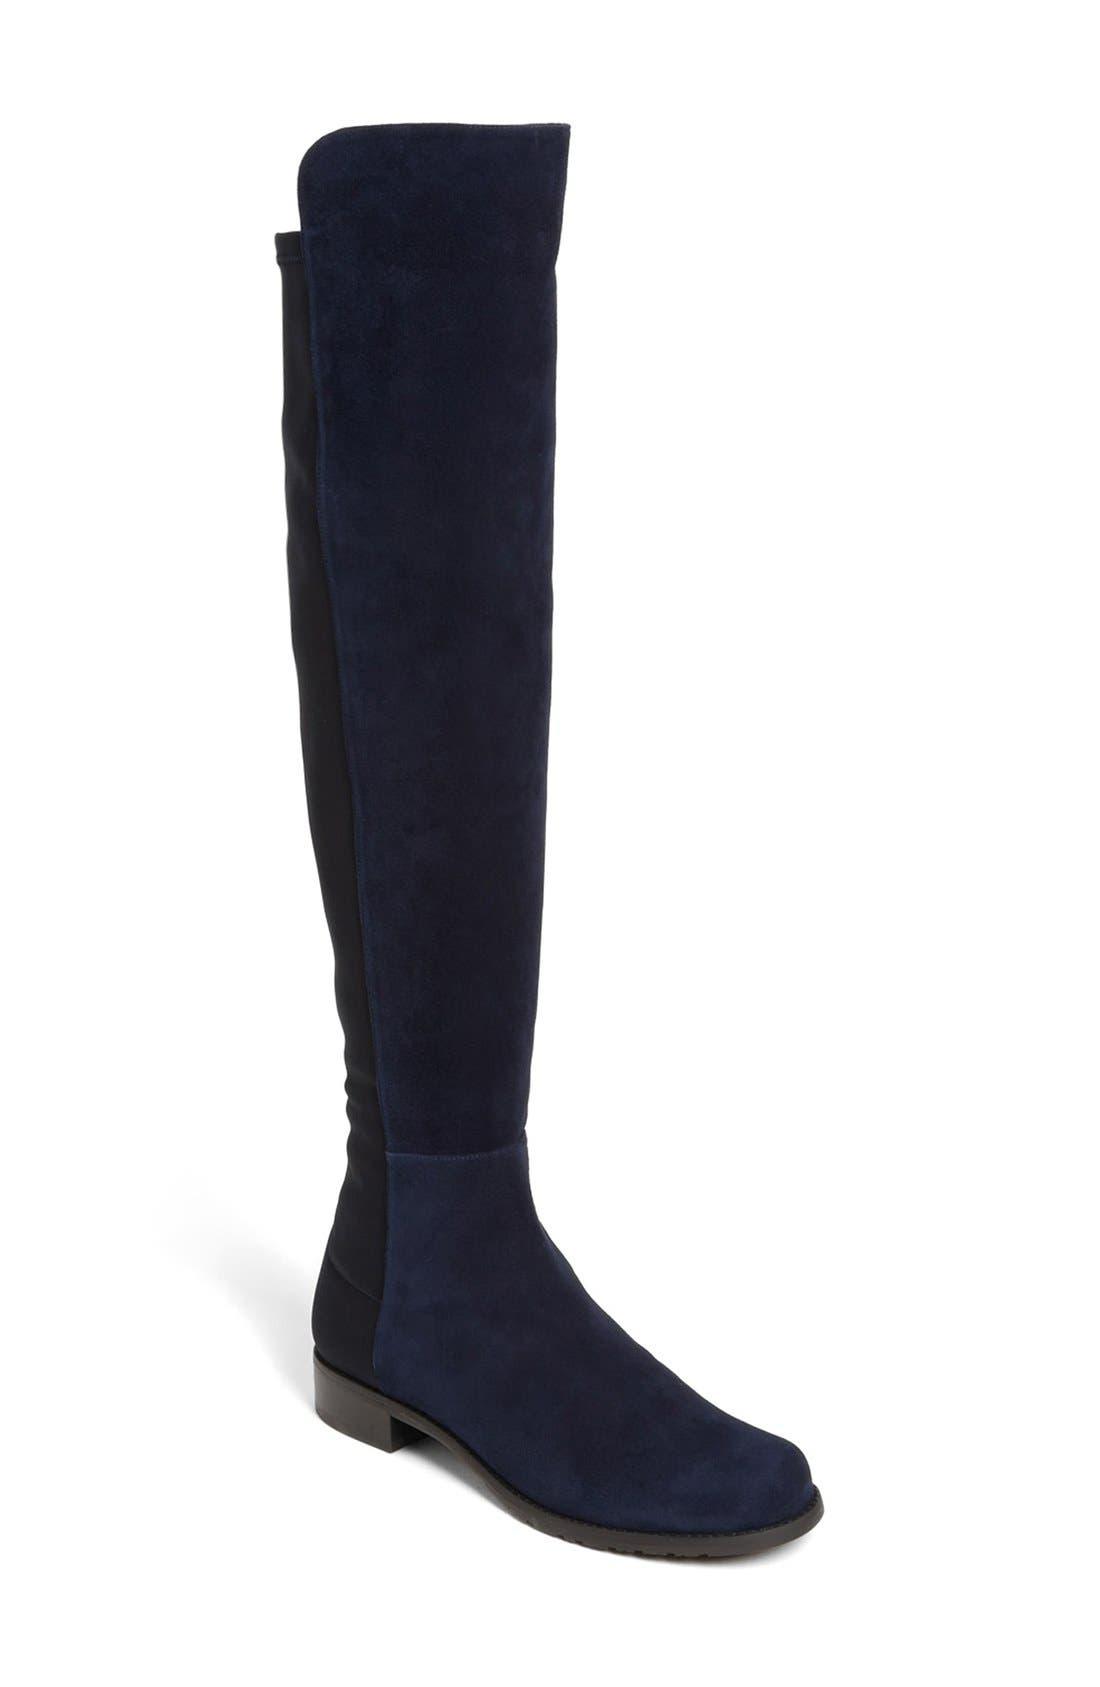 Main Image - Stuart Weitzman 5050 Over the Knee Leather Boot (Women)